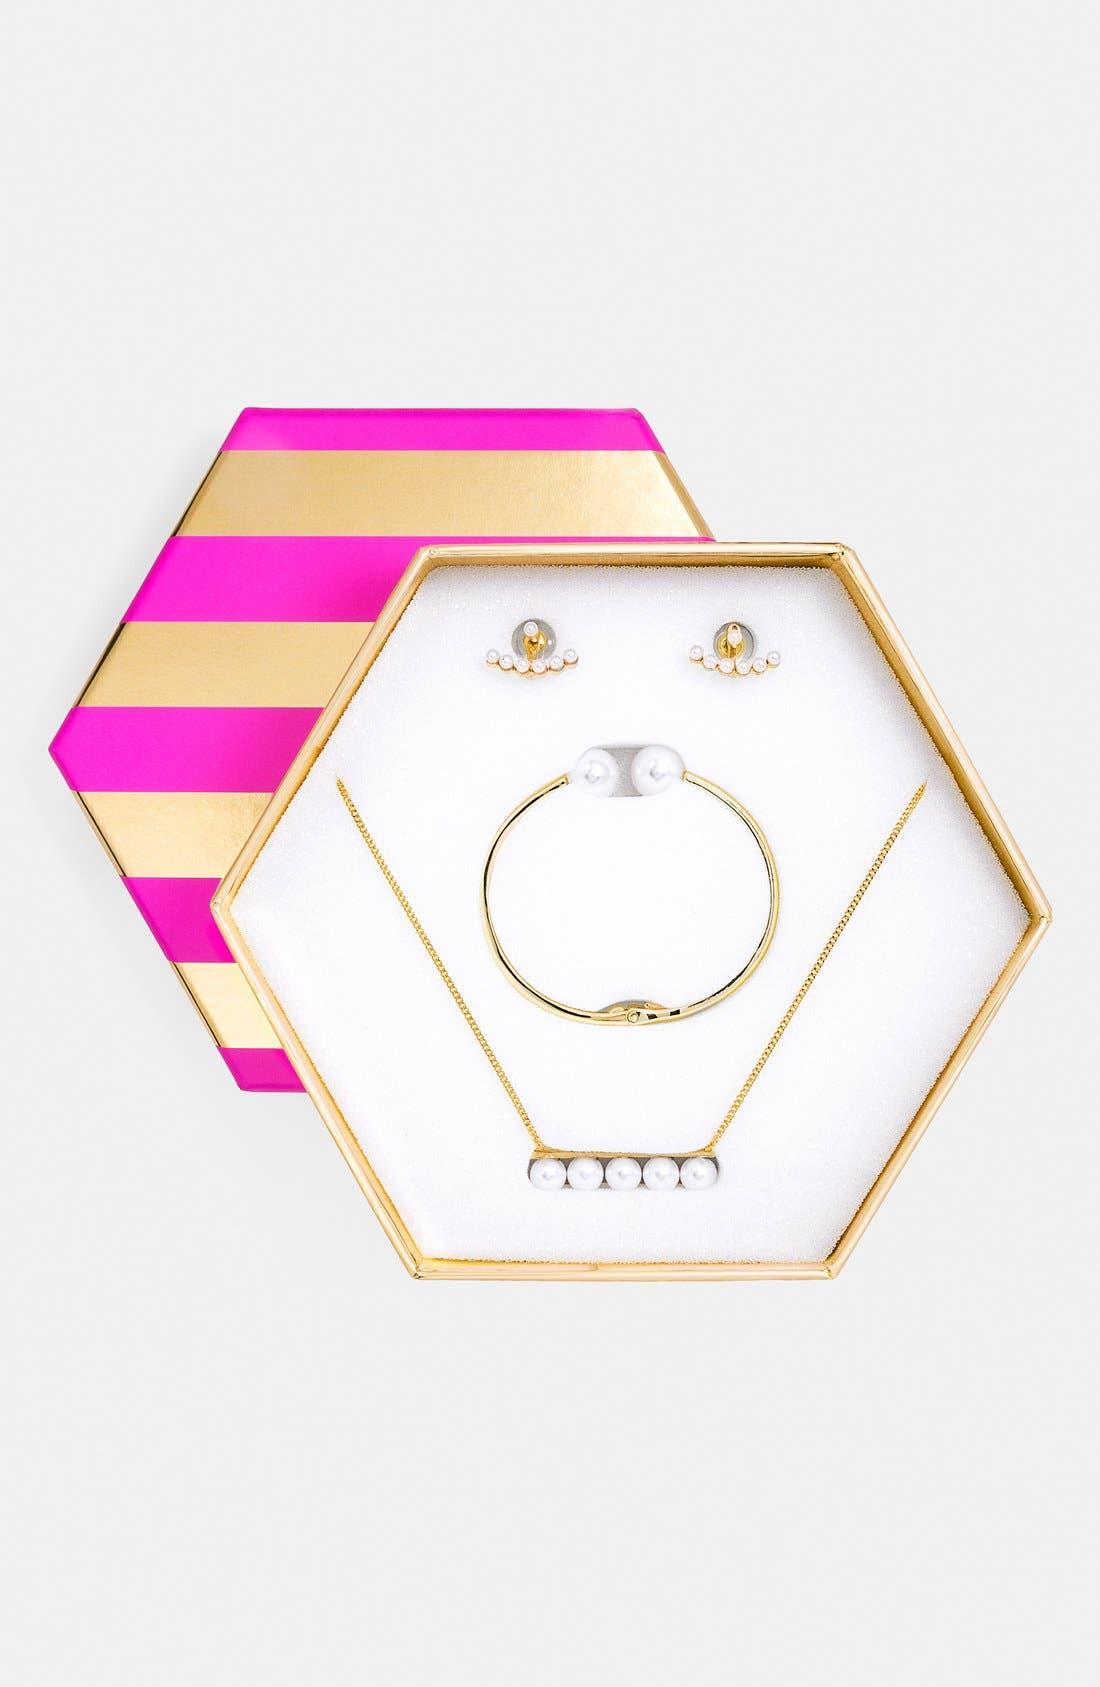 Main Image - BaubleBar 'Trending: Modern Pearly Bead' Necklace, Bracelet & Ear Jacket Gift Set